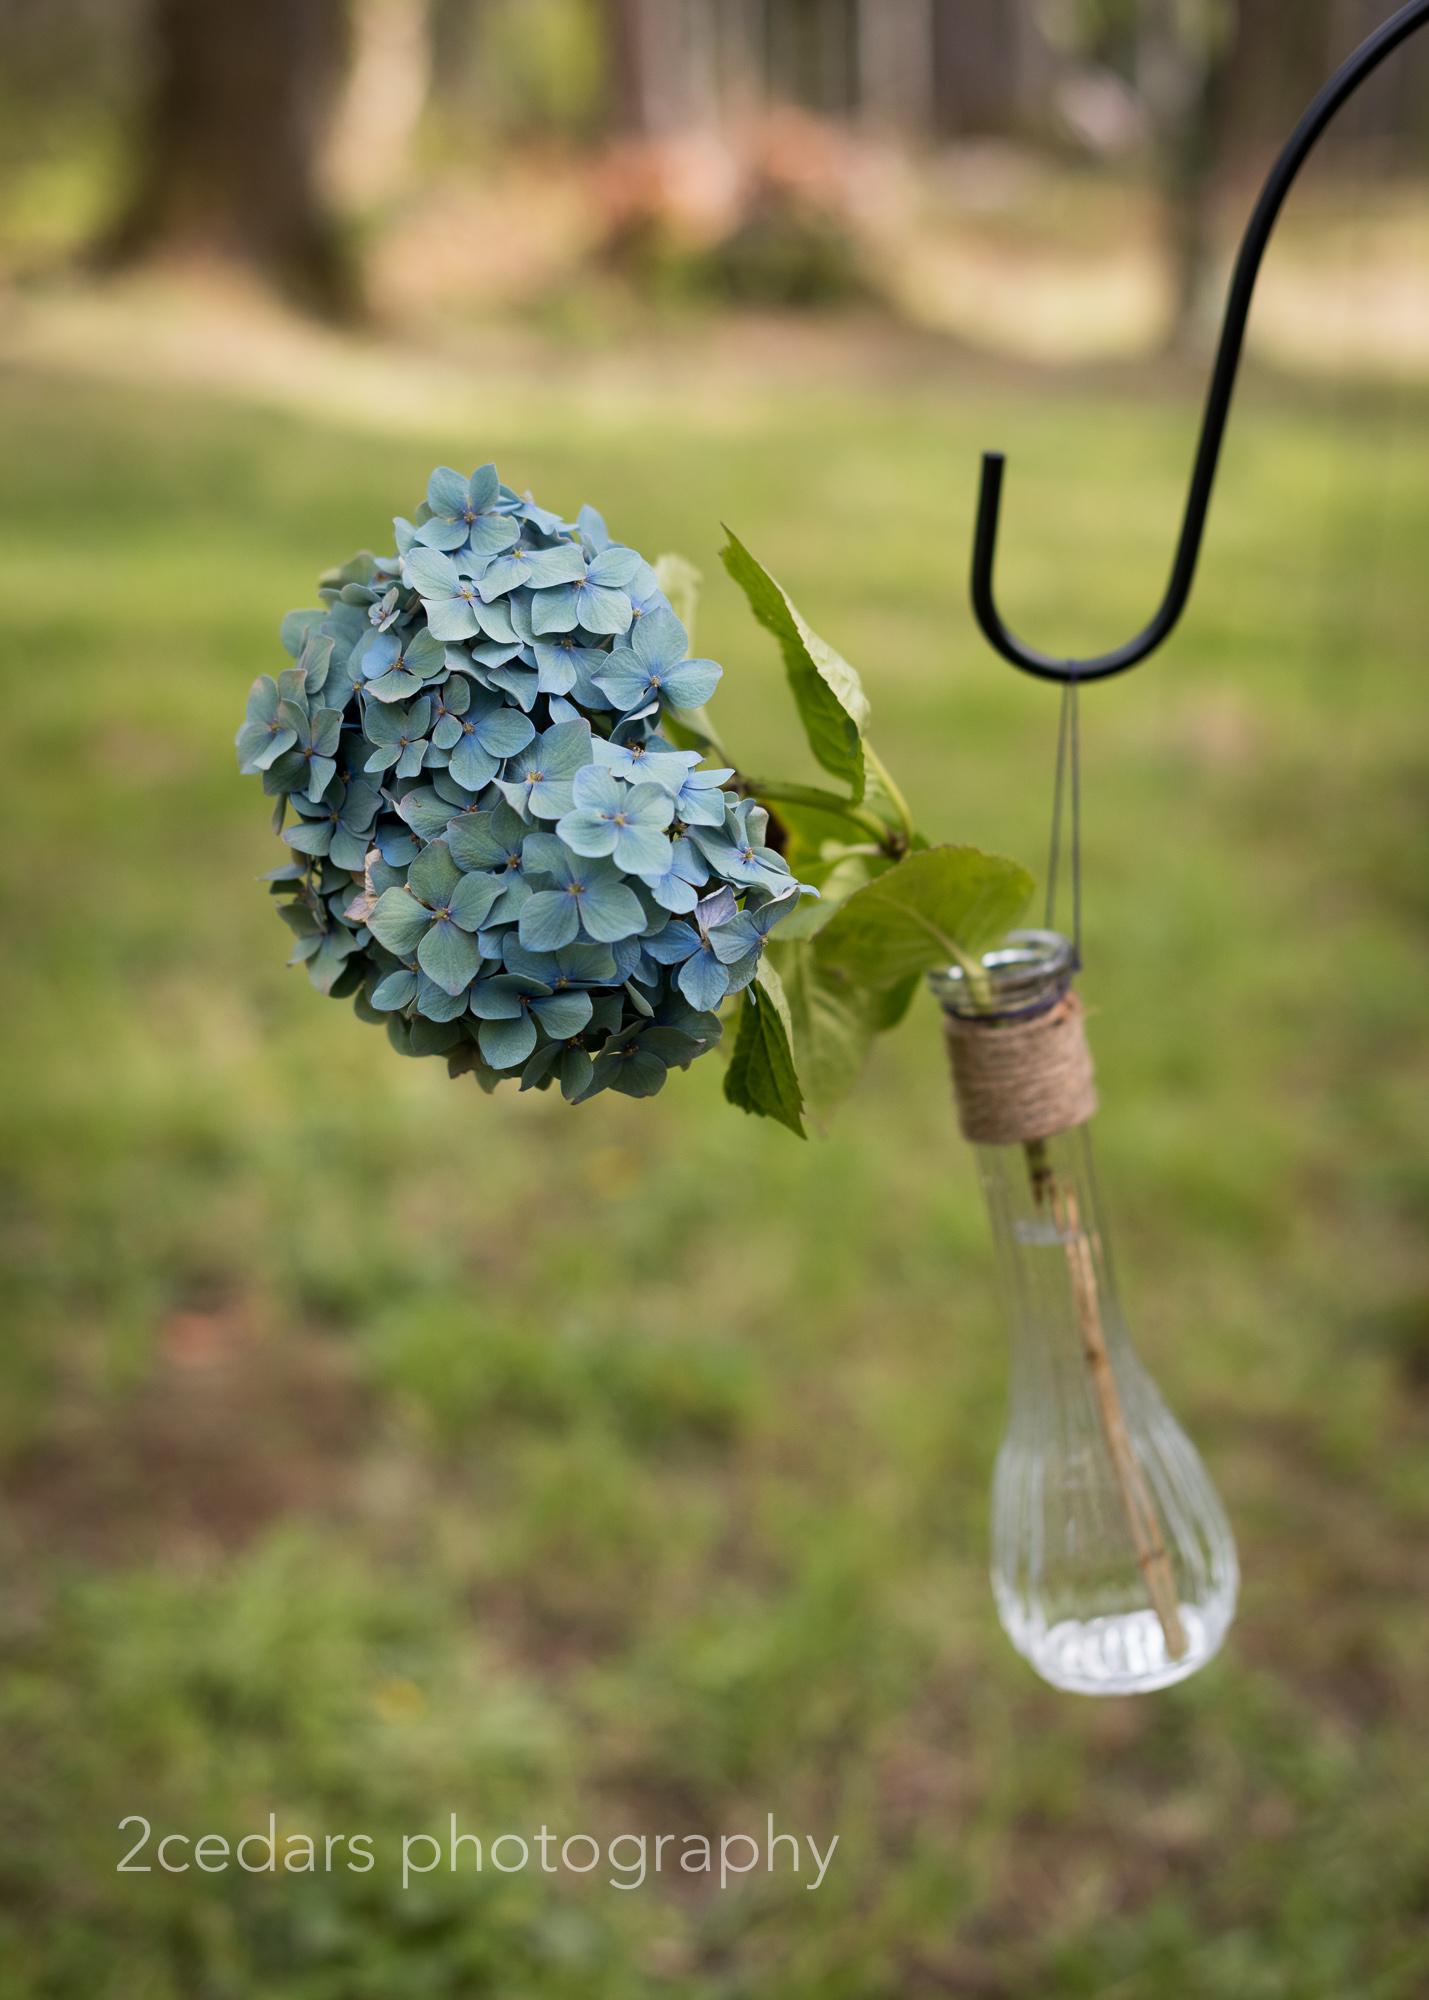 Hydrangeas in a bottle natural wedding decor